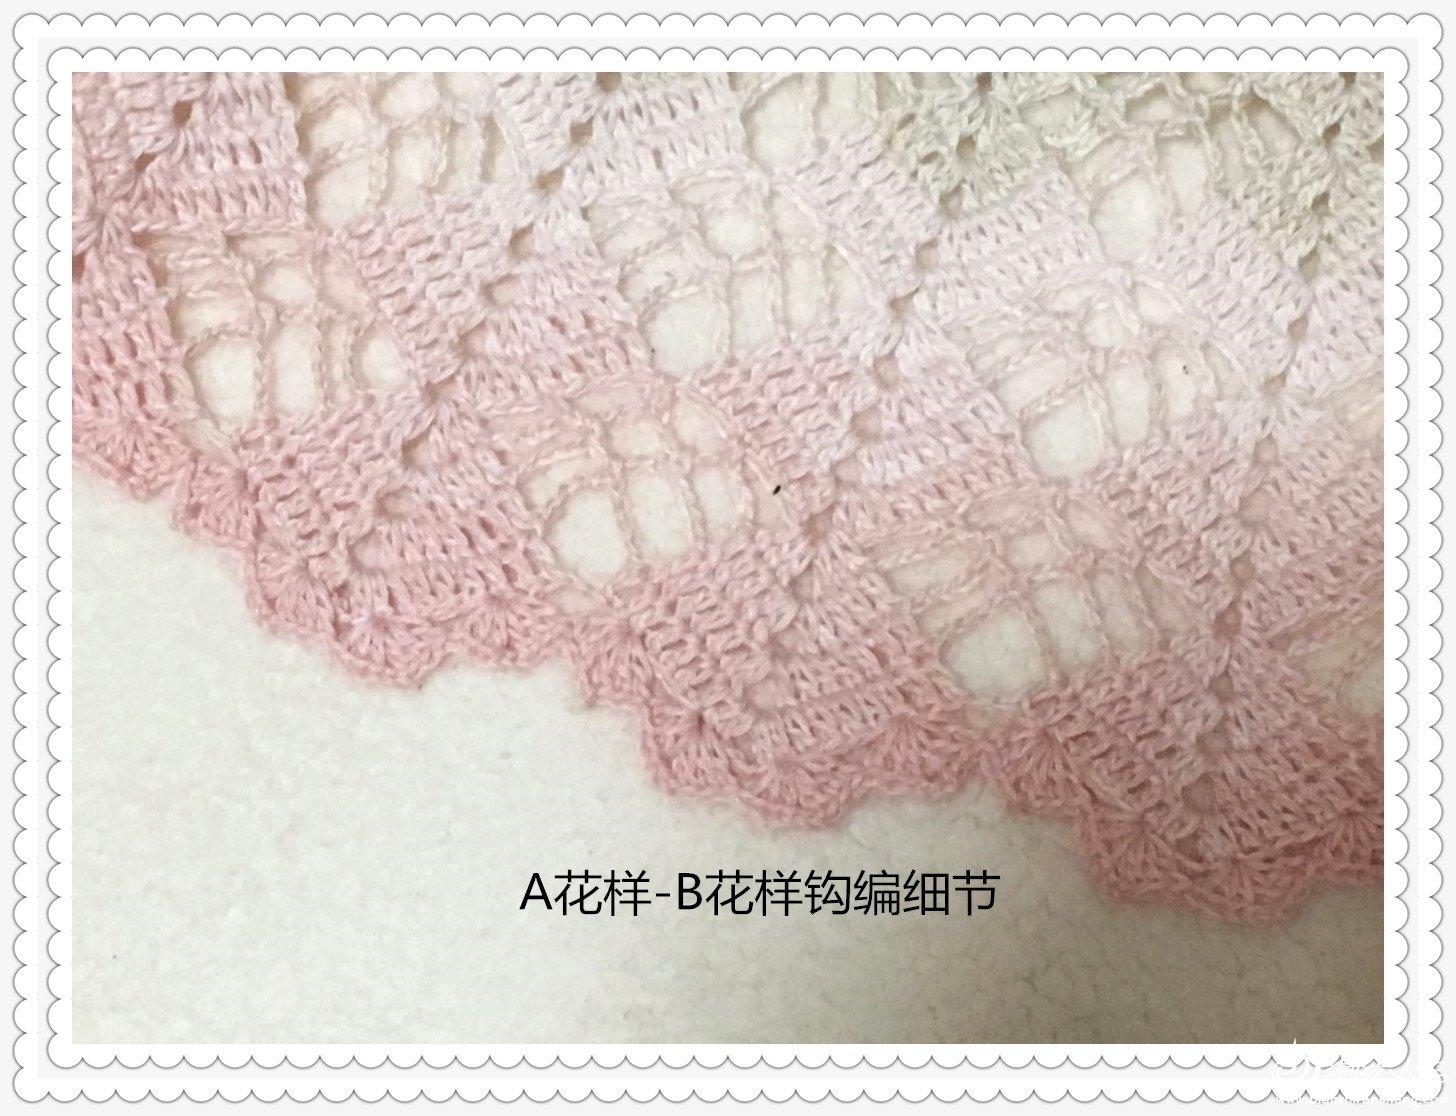 QQ图片20180213192726_副本.jpg